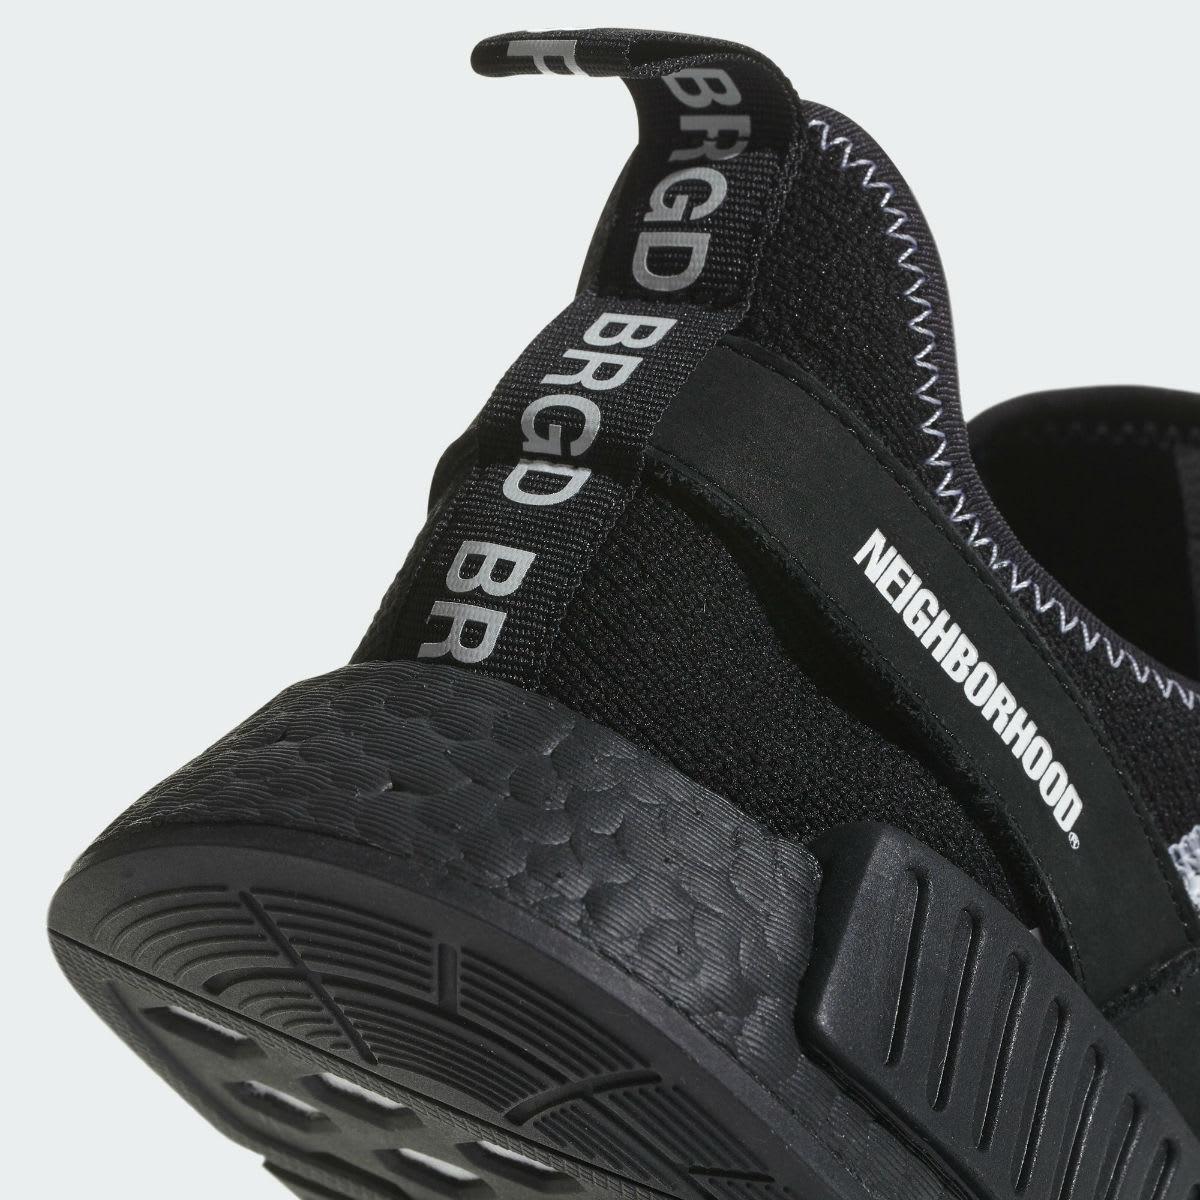 Neighborhood x Adidas NMD R1 Release Date DA8835 Pull-Tab